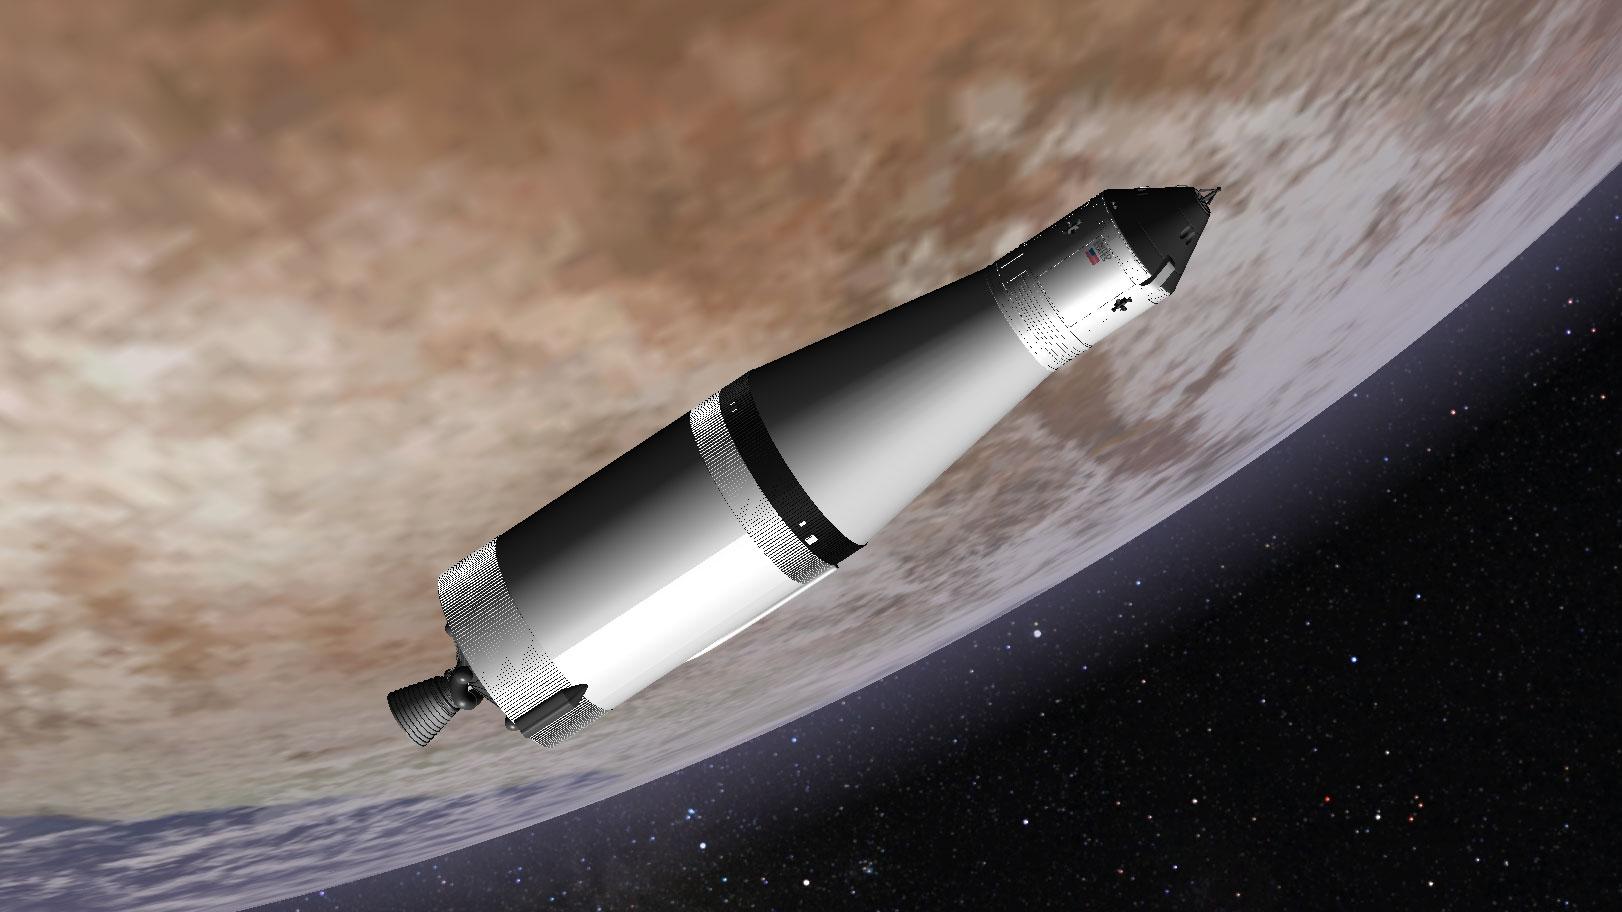 mission apollo spacecraft - photo #17